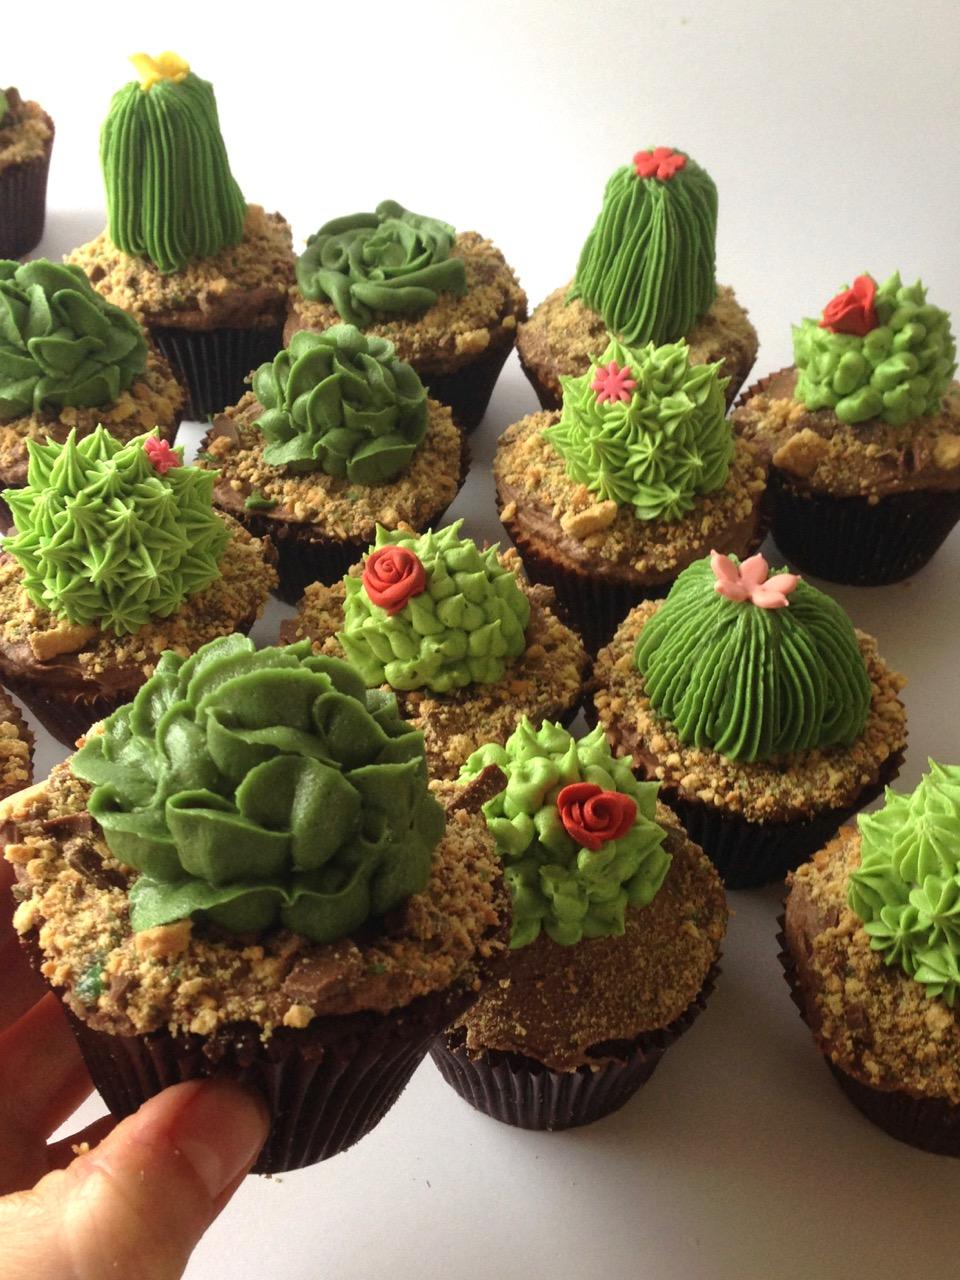 Rozanne S Cakes Coolest Cactus Cupcakes